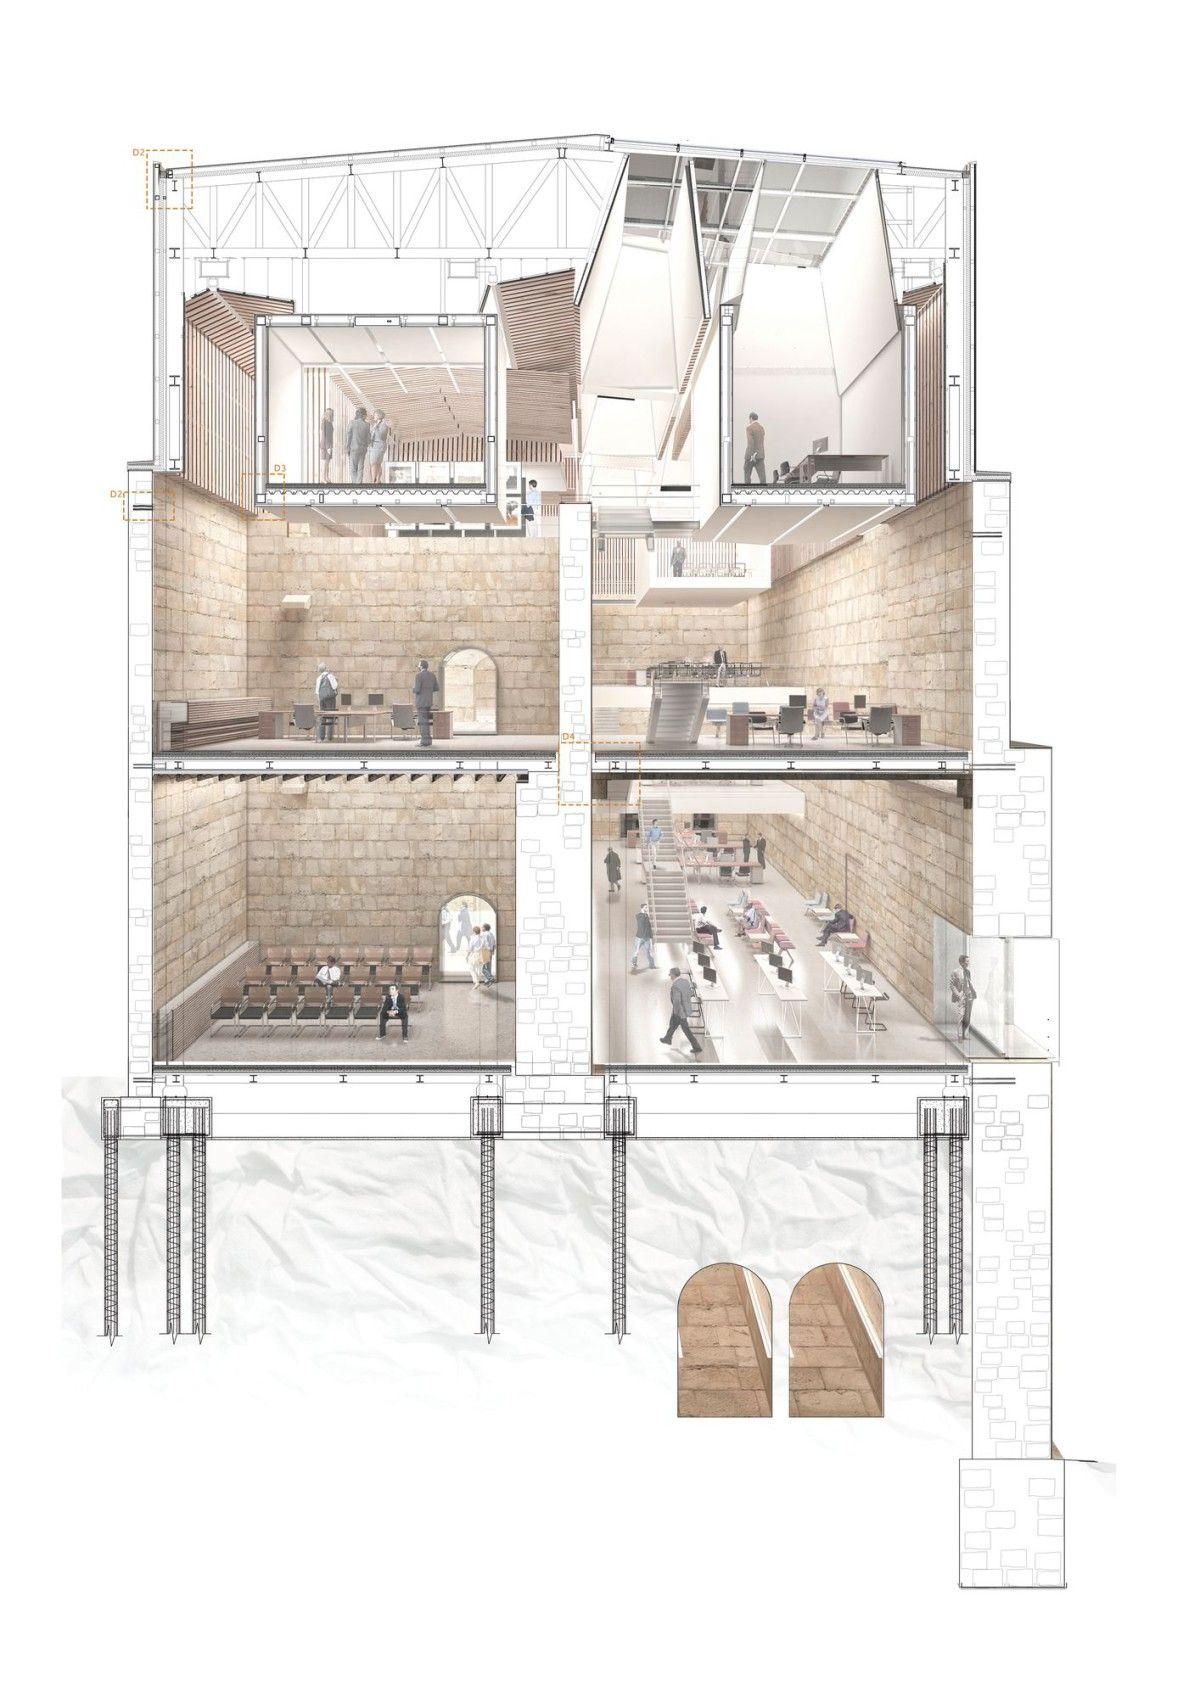 Rub n lasanta edificio usos mixtos casalarreina 13 for Architettura di interni